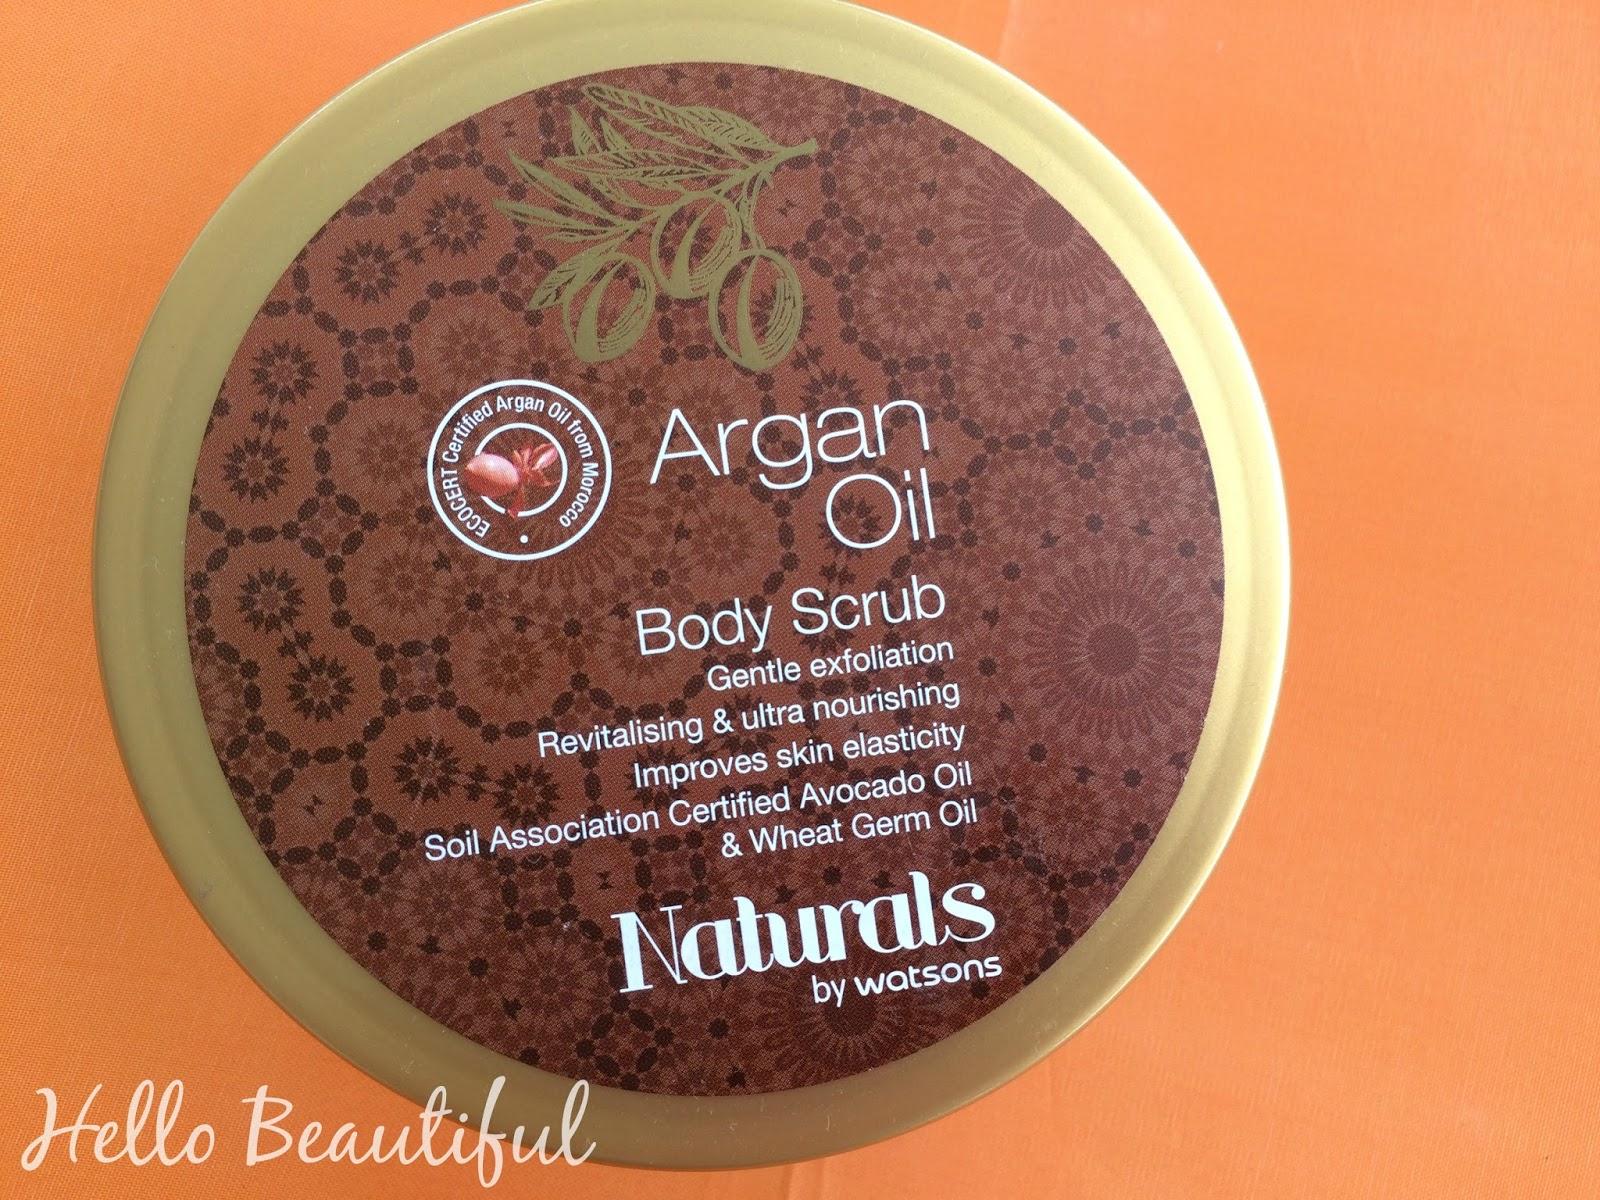 Watsons Naturals Argon Oil Hair Oil Hair Mask And Body Scrub